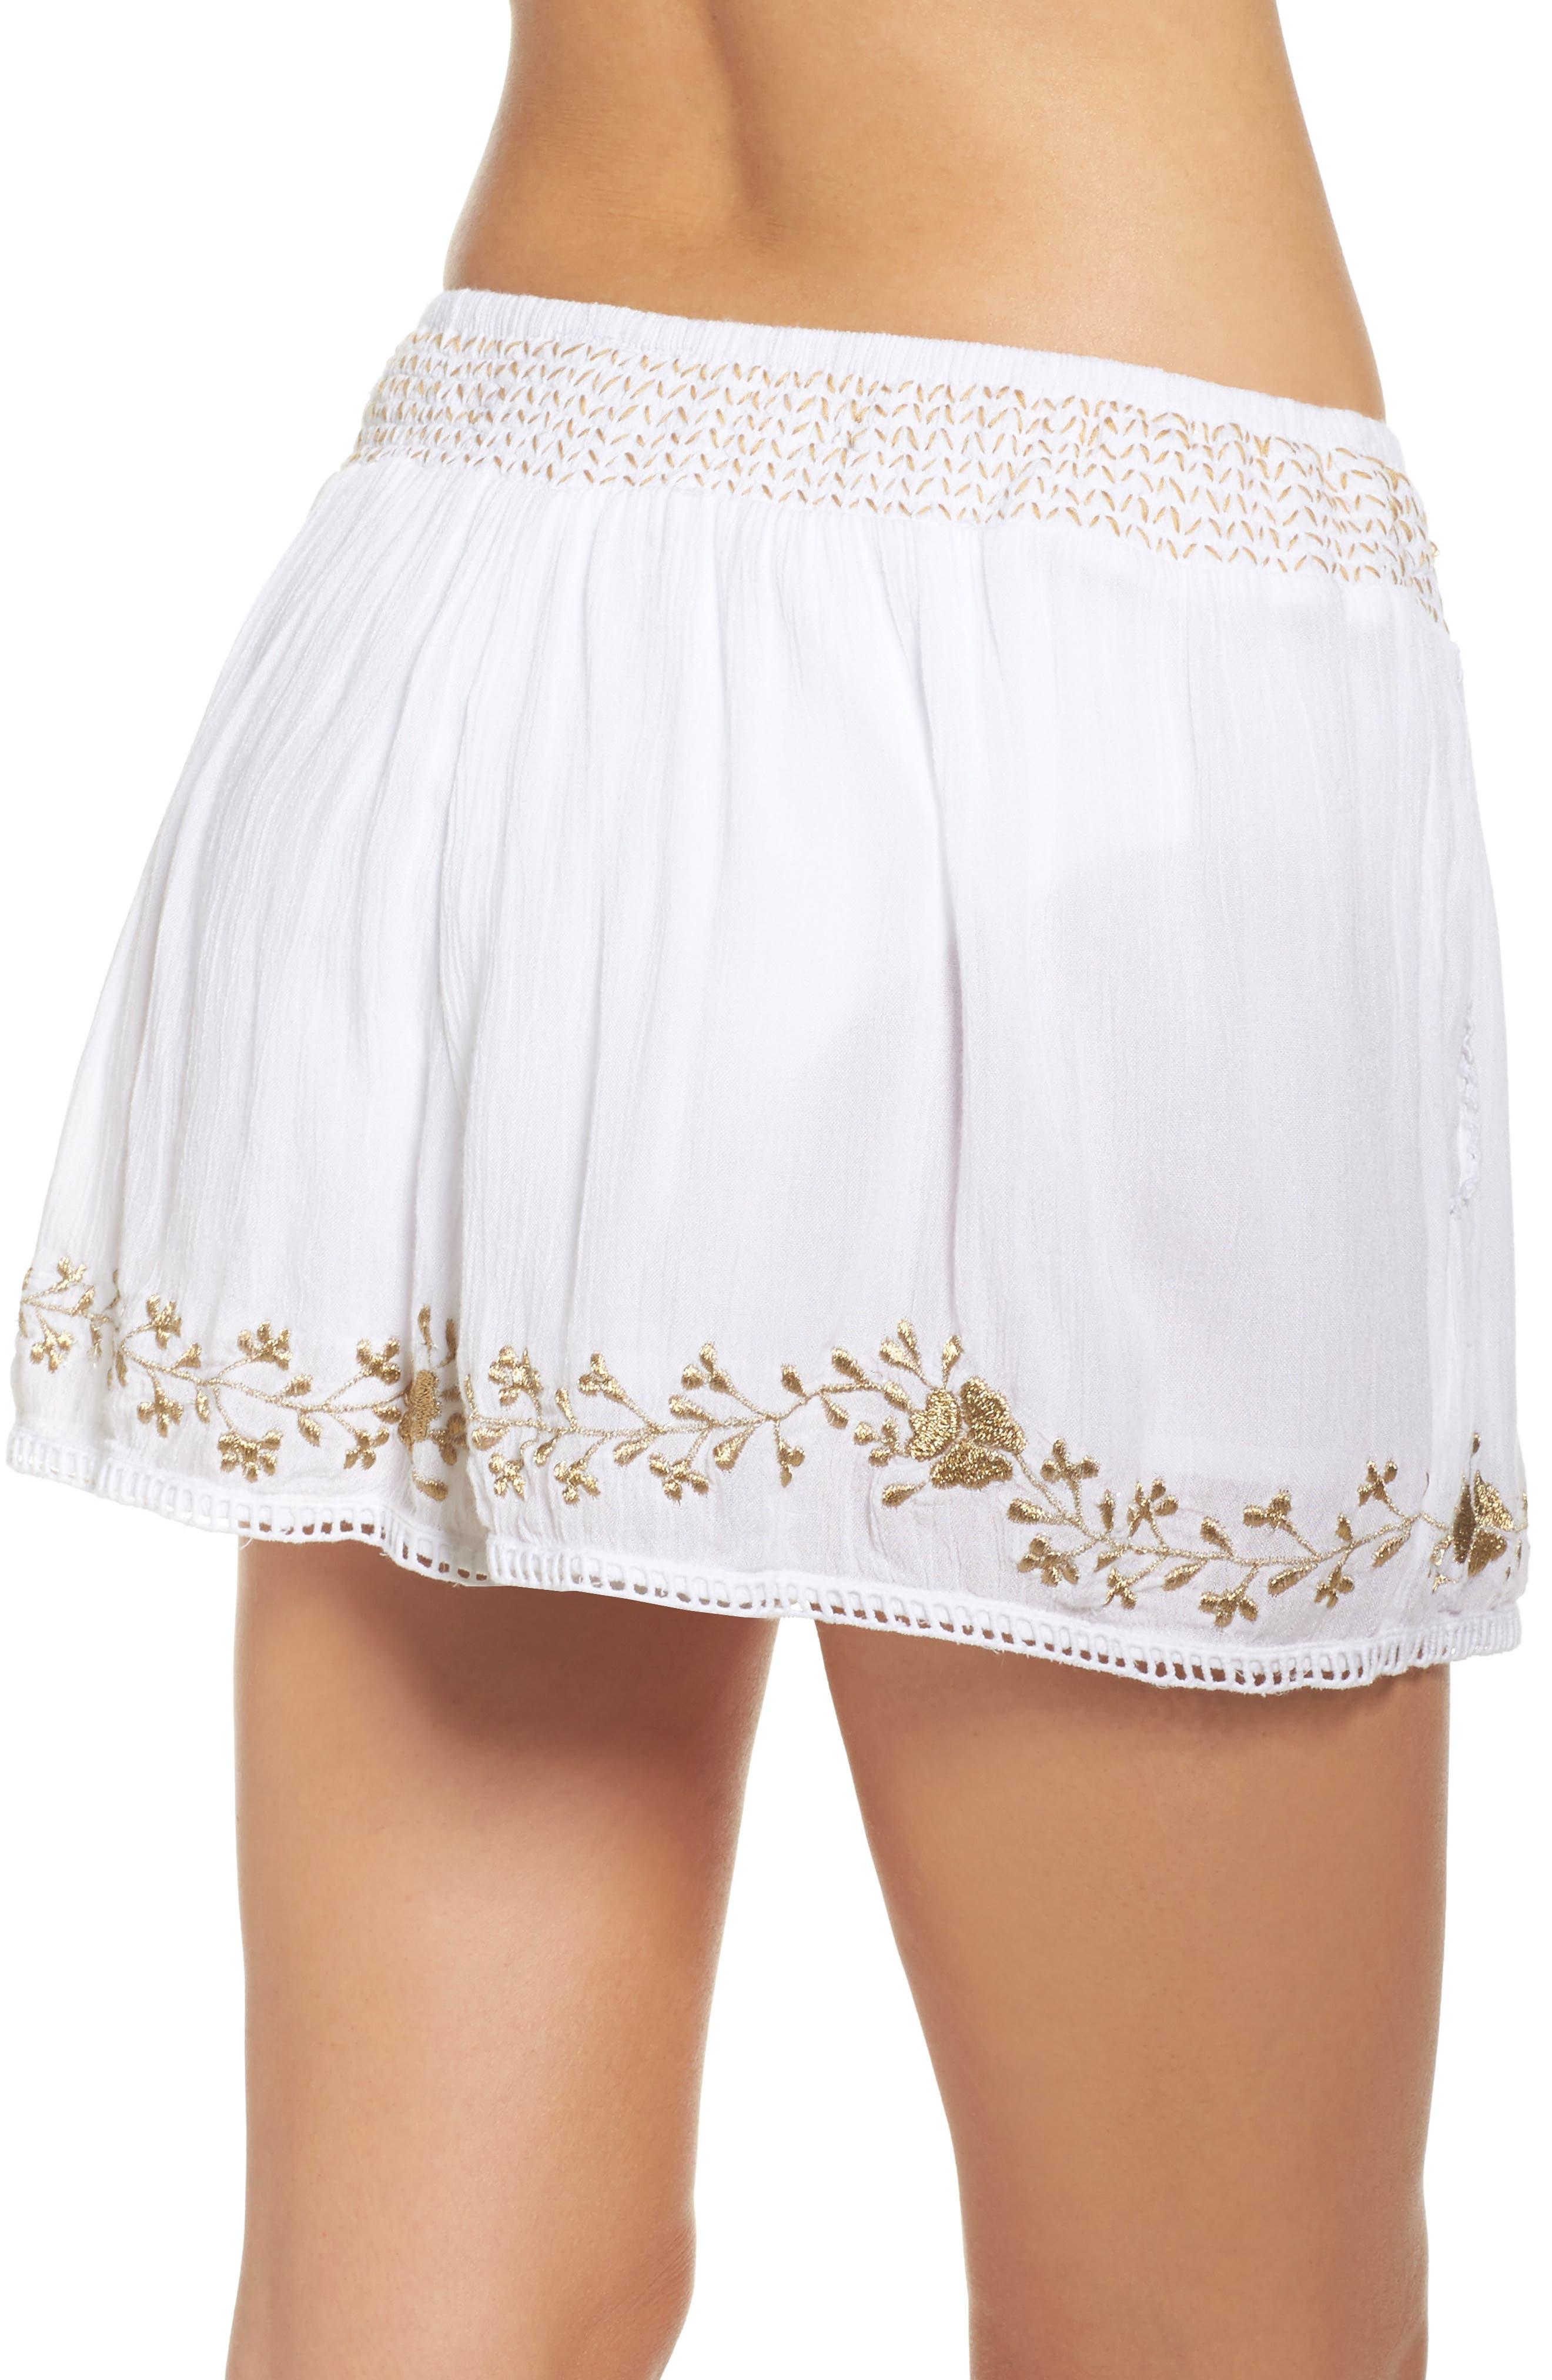 Alternate Image 2  - Muche at Muchette Cleopatra Shorts